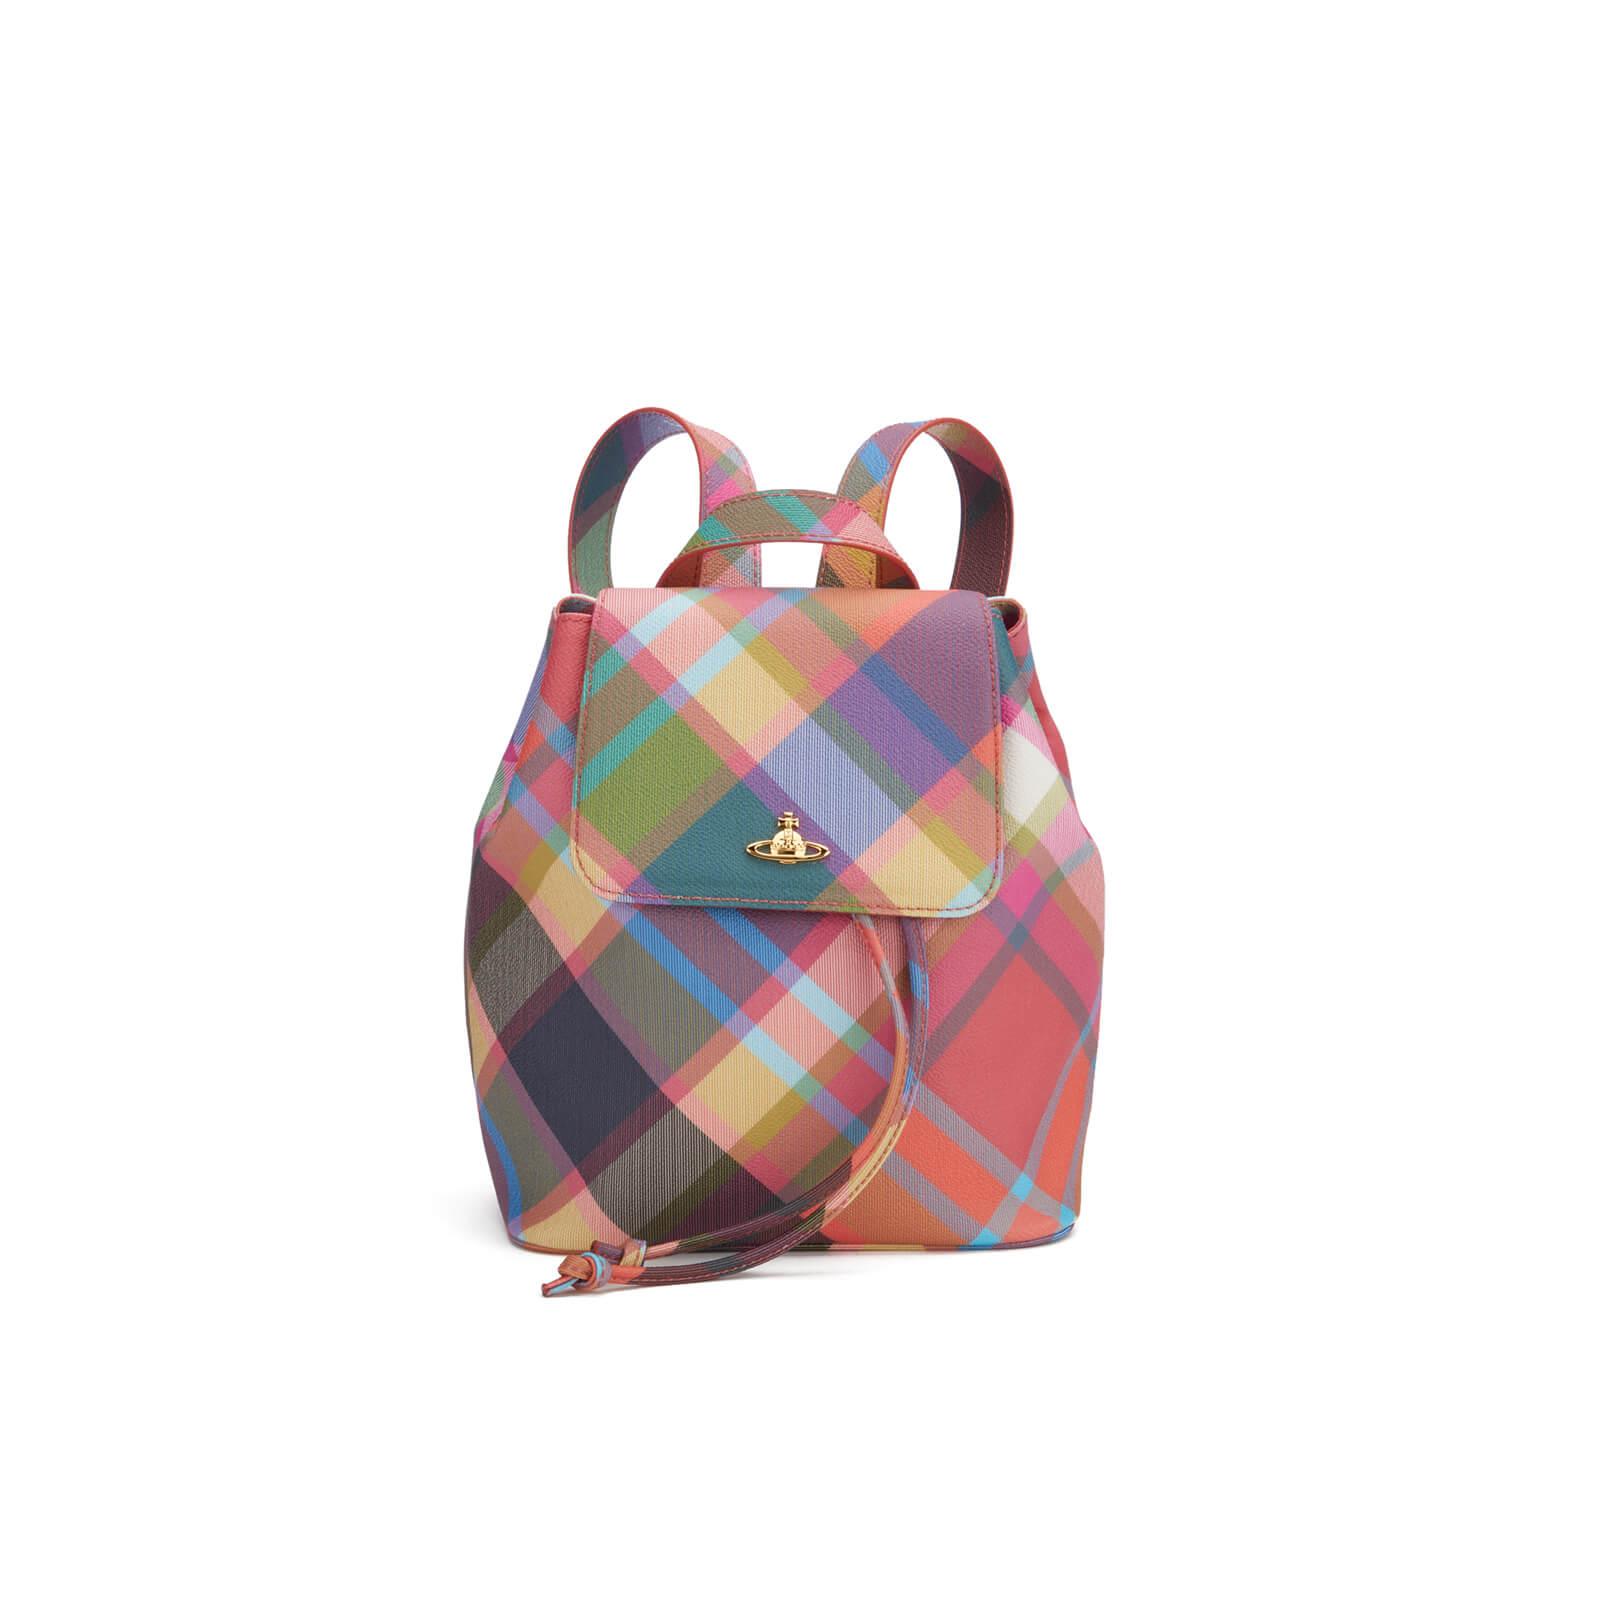 d34408a8578 Vivienne Westwood Women's Derby Backpack - Harlequin - Free UK Delivery  over £50